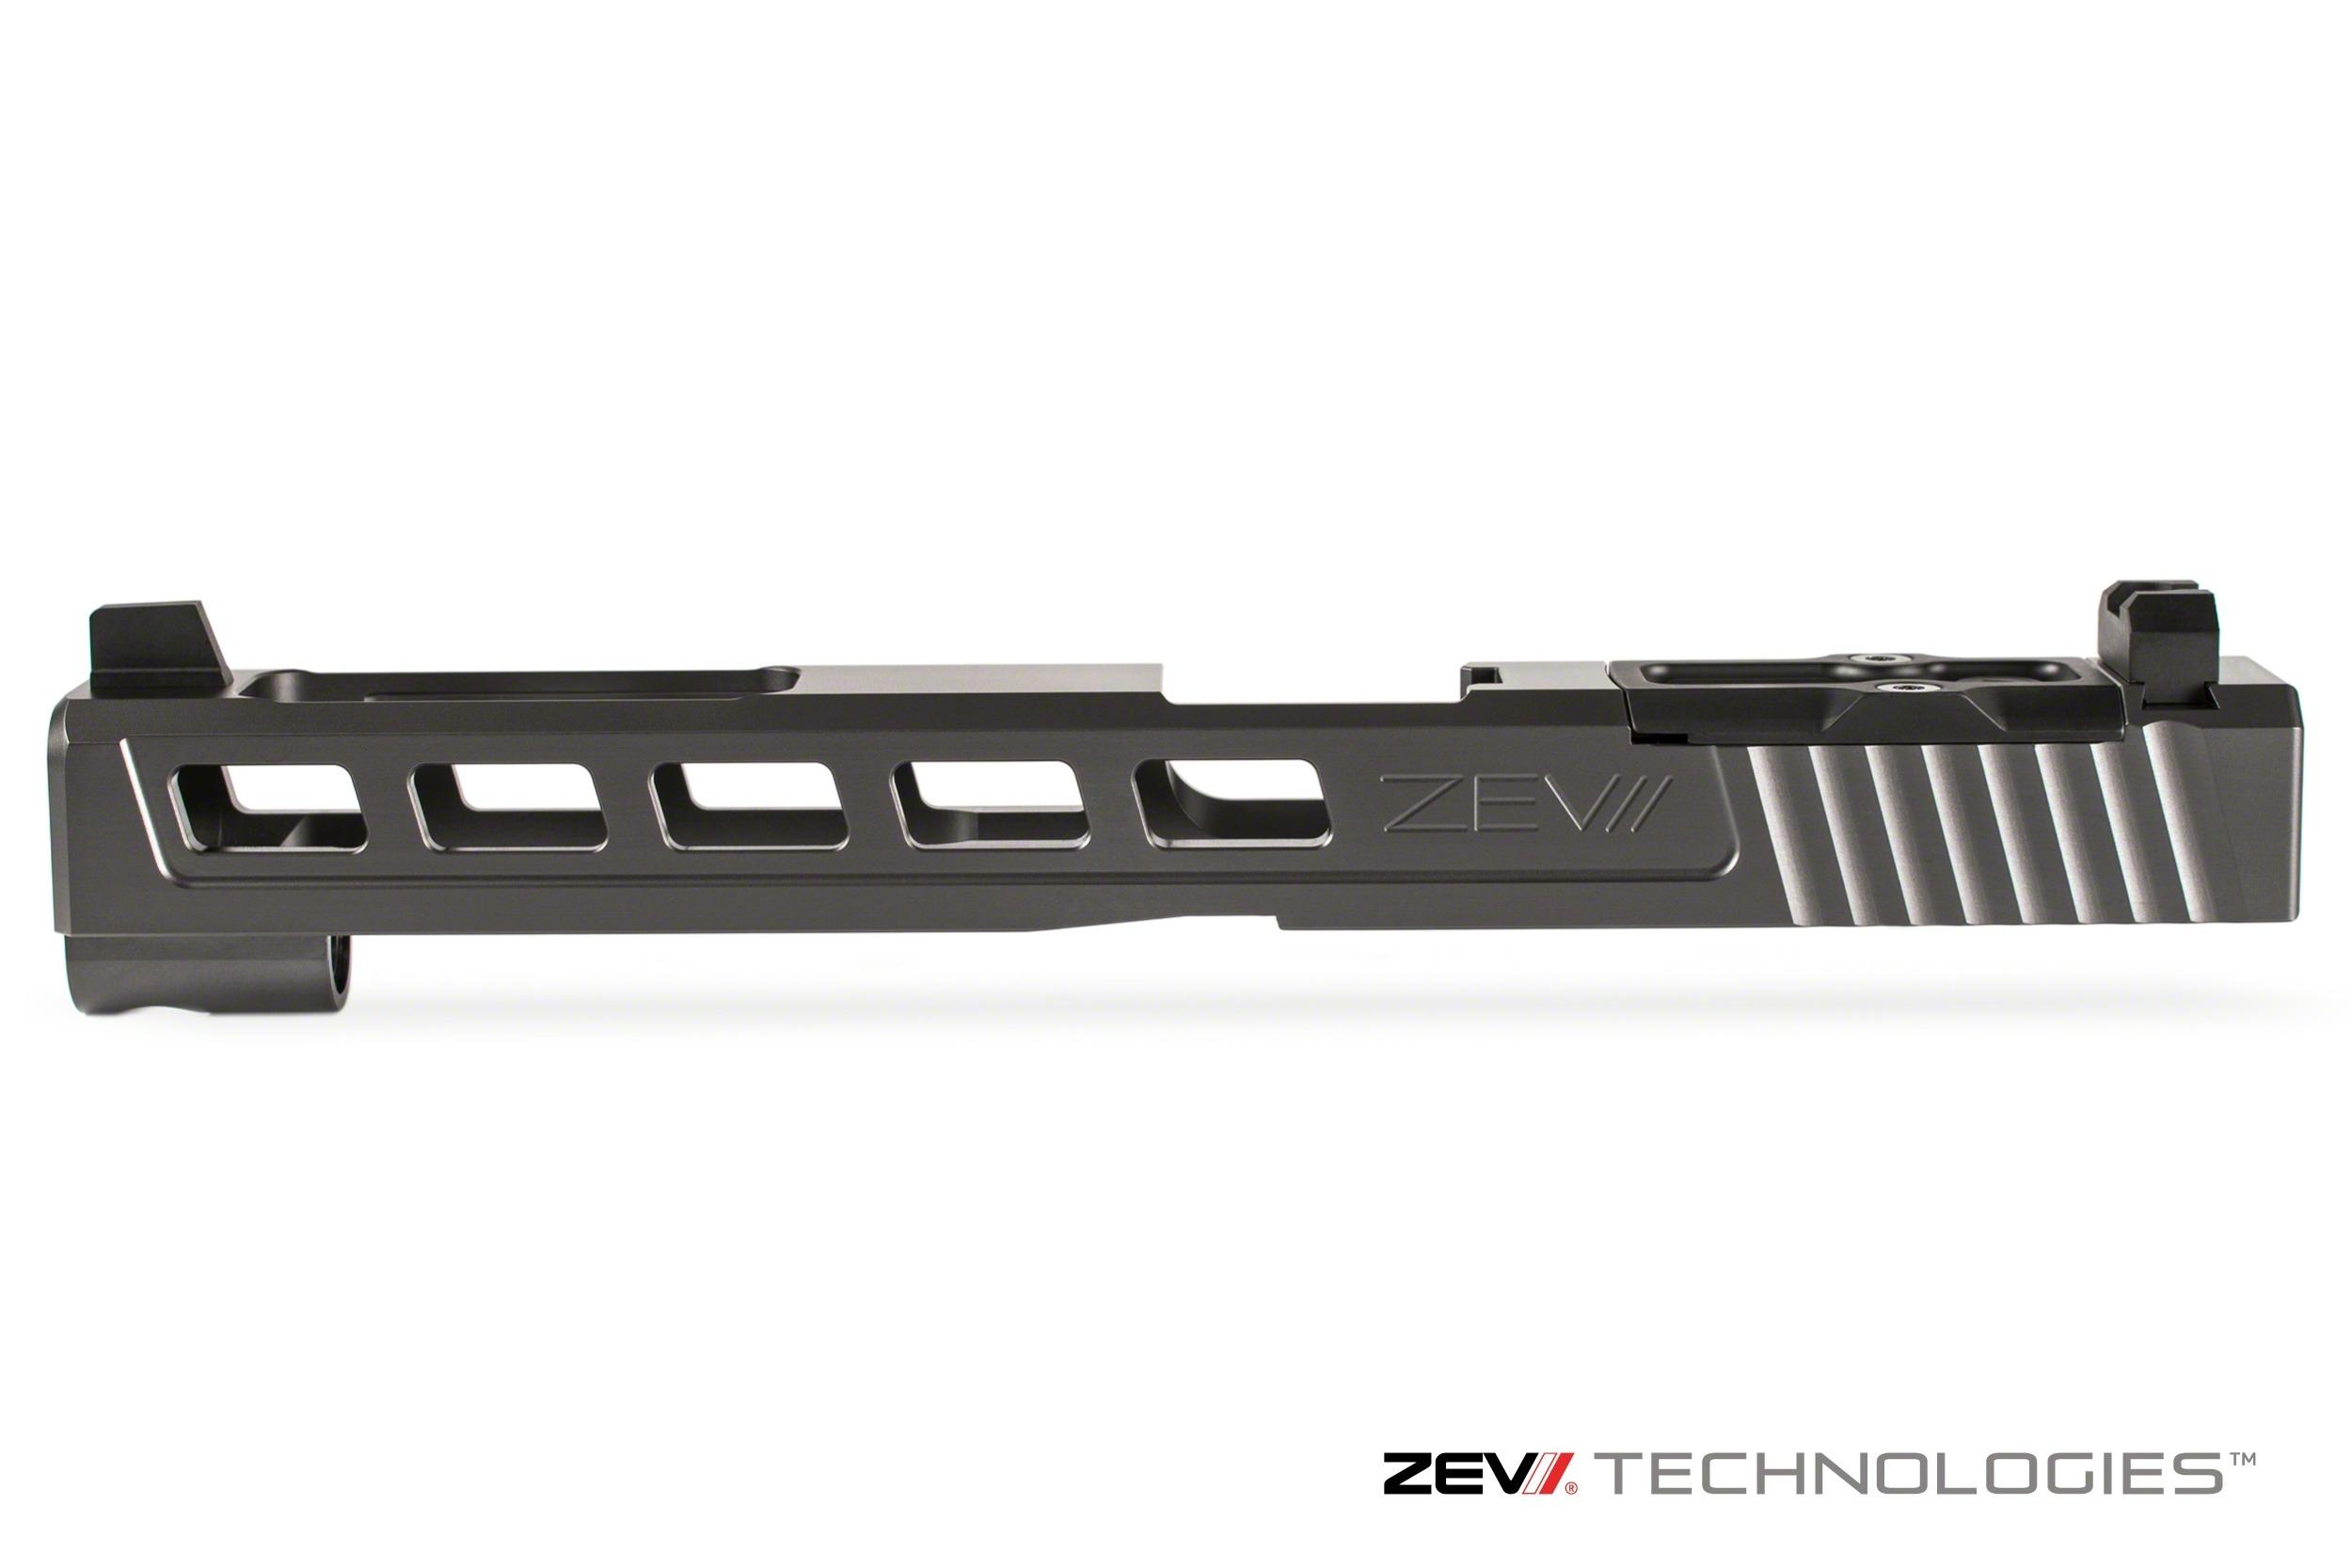 Zev Technologies Z34 Dragonfly Gray 4Th Gen Slide Kit – Walmart With Regard To Zev Blue Fish Metal Garden Benches (View 19 of 25)